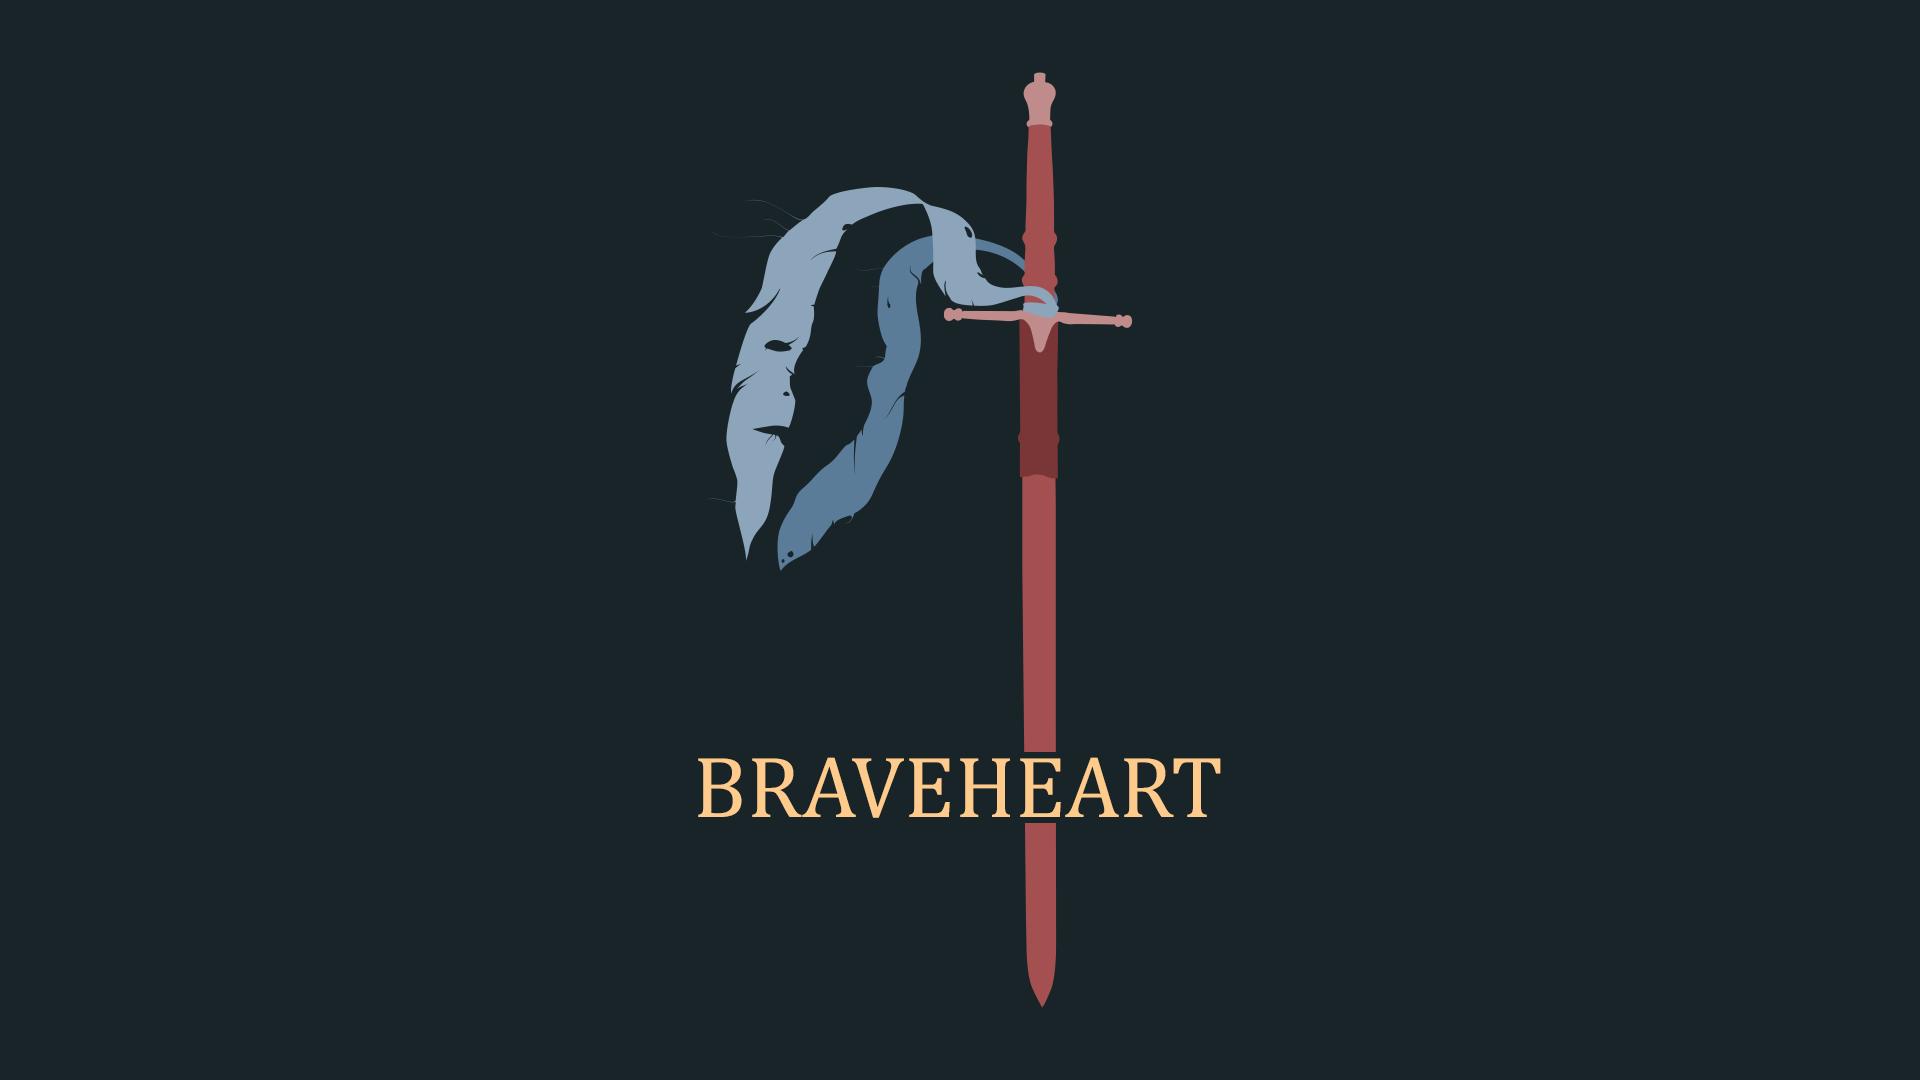 Braveheart Braveheart Mel Gibson Movies